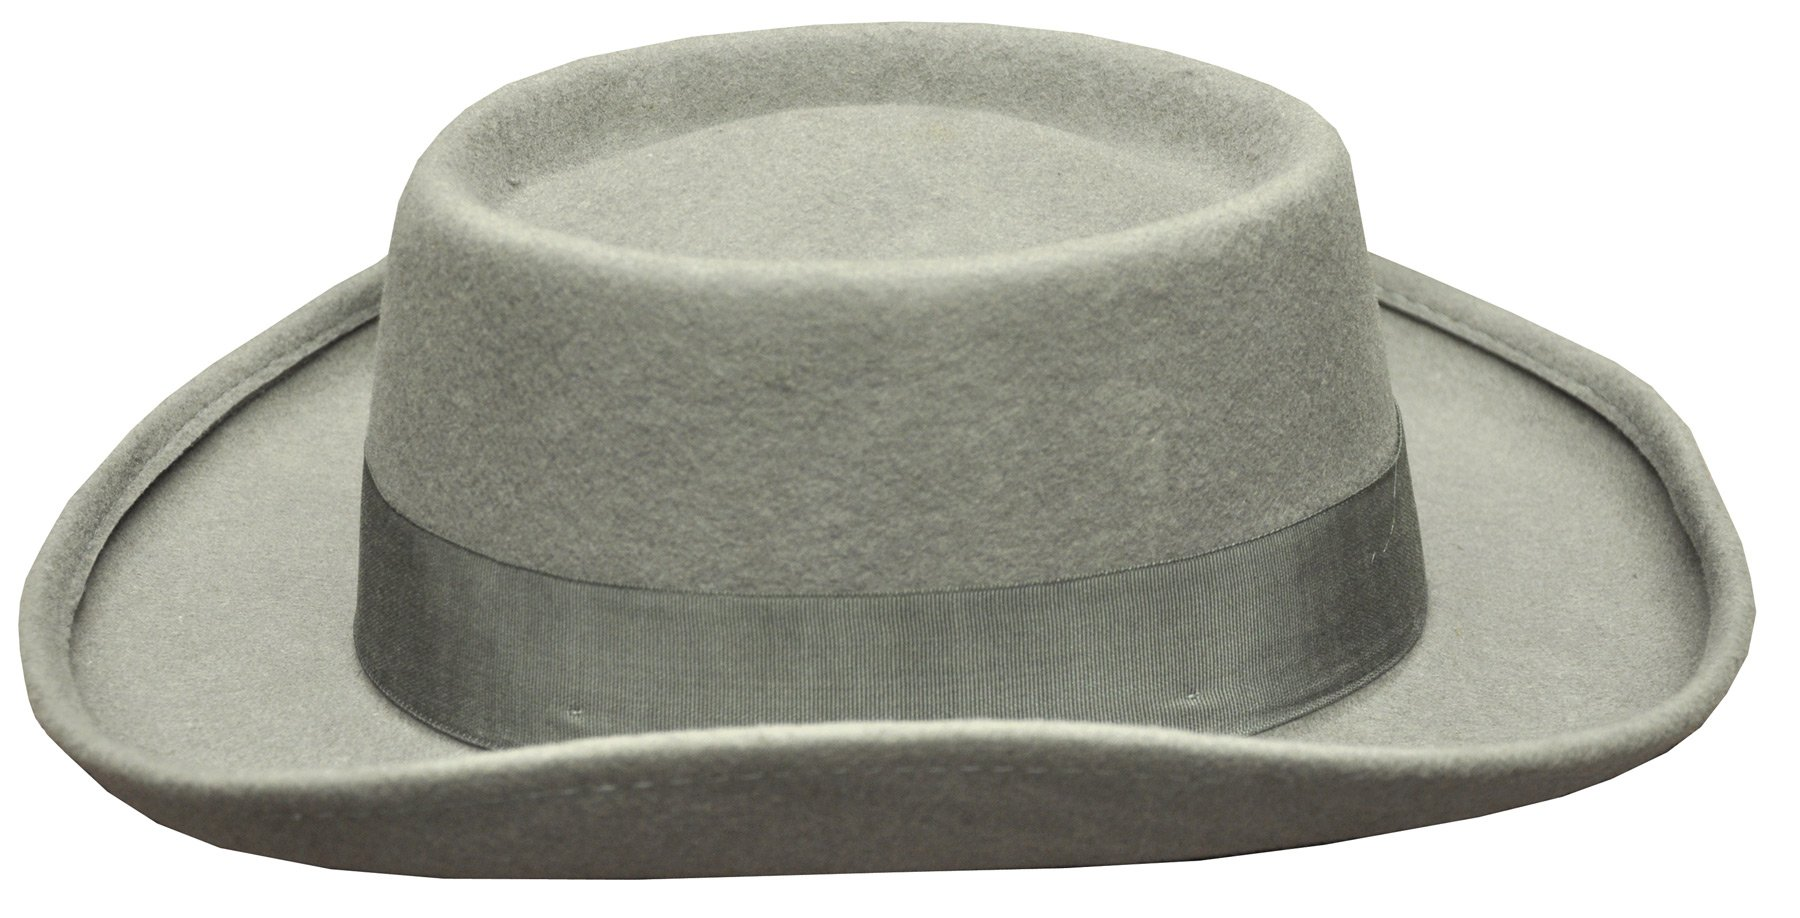 UHC Adult Men's Planter Panama Style Straw Summer Hat Costume Accessory (Grey), L